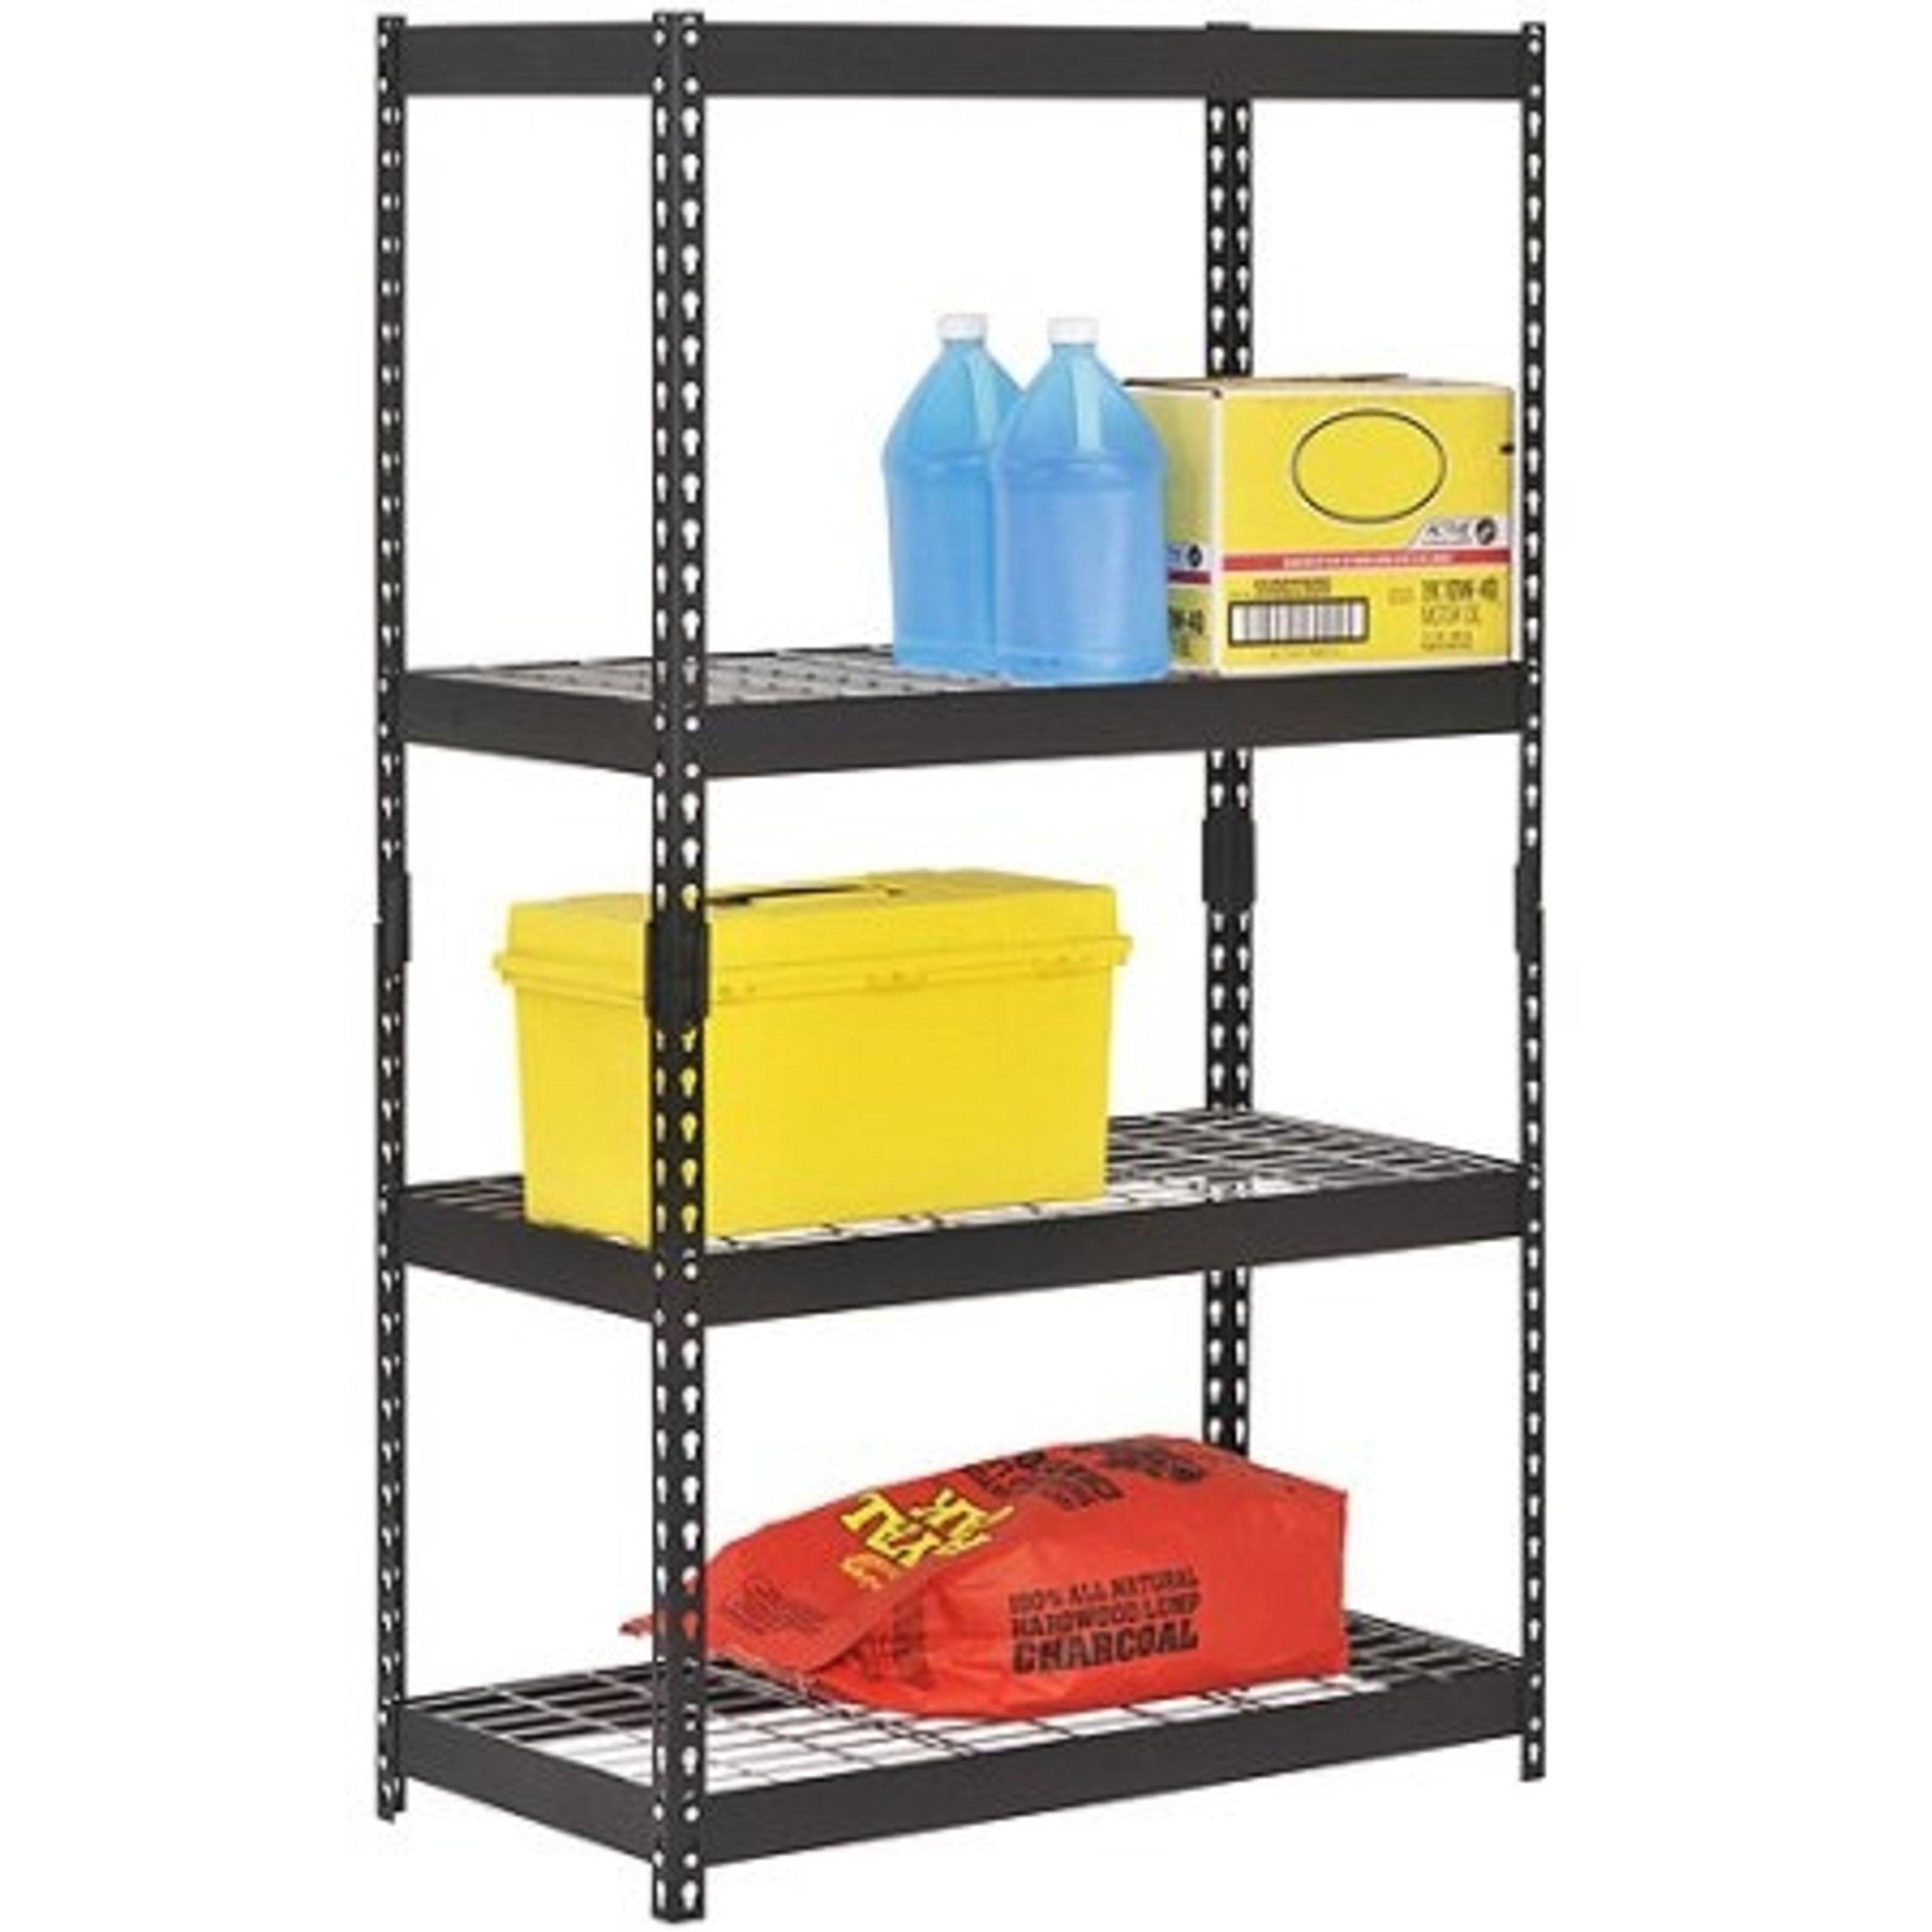 4-Shelf Durable Steel Construction Heavy-Duty Black Shelving Unit